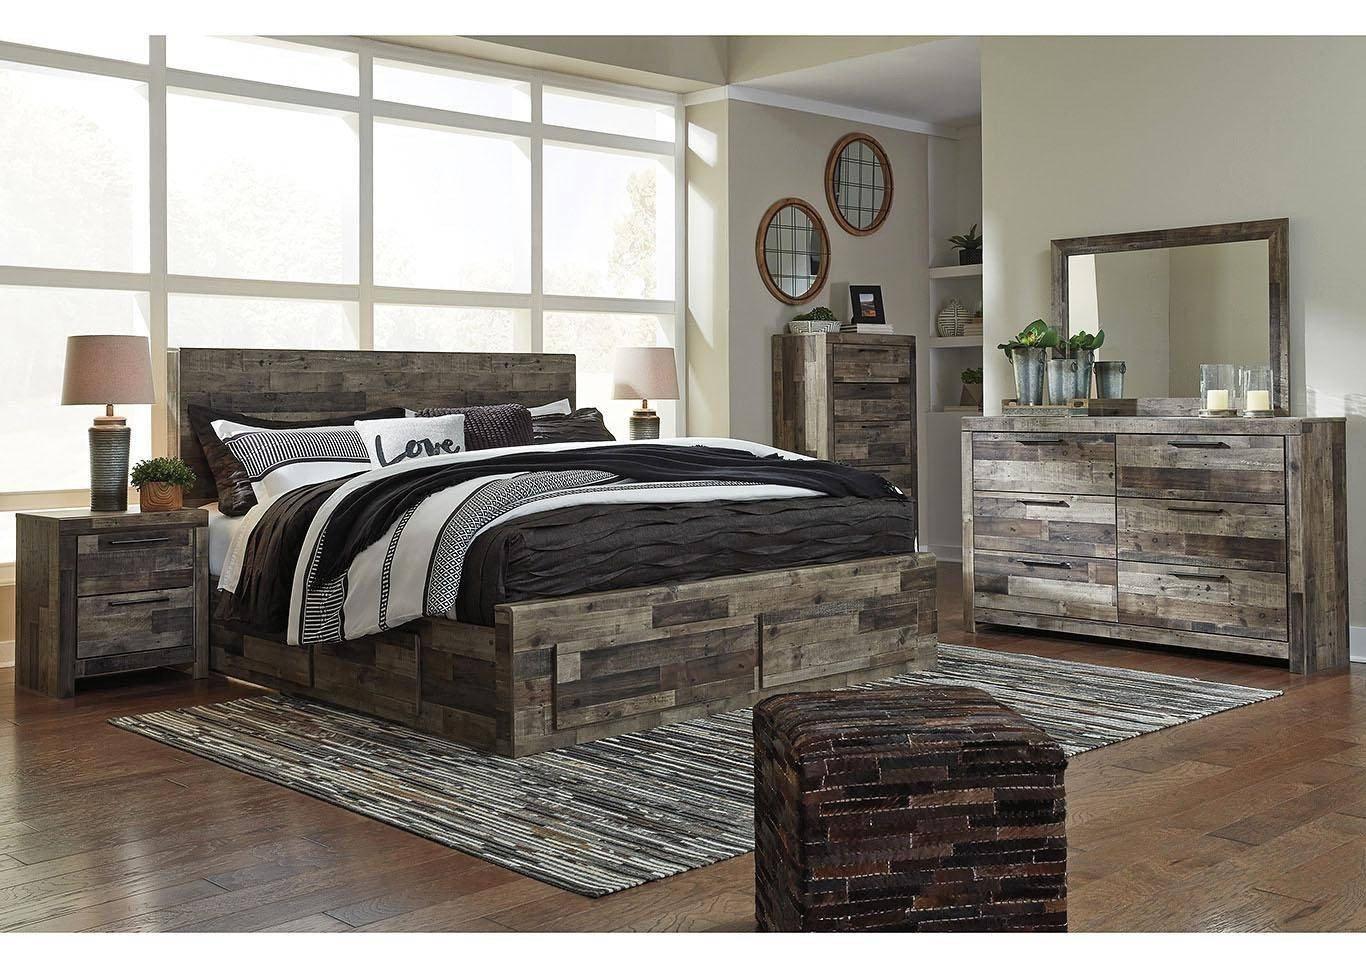 Ashley White Bedroom Set Best Of ashley Derekson King Storage Bedroom Set 6 Pcs In Multi Gray Wood